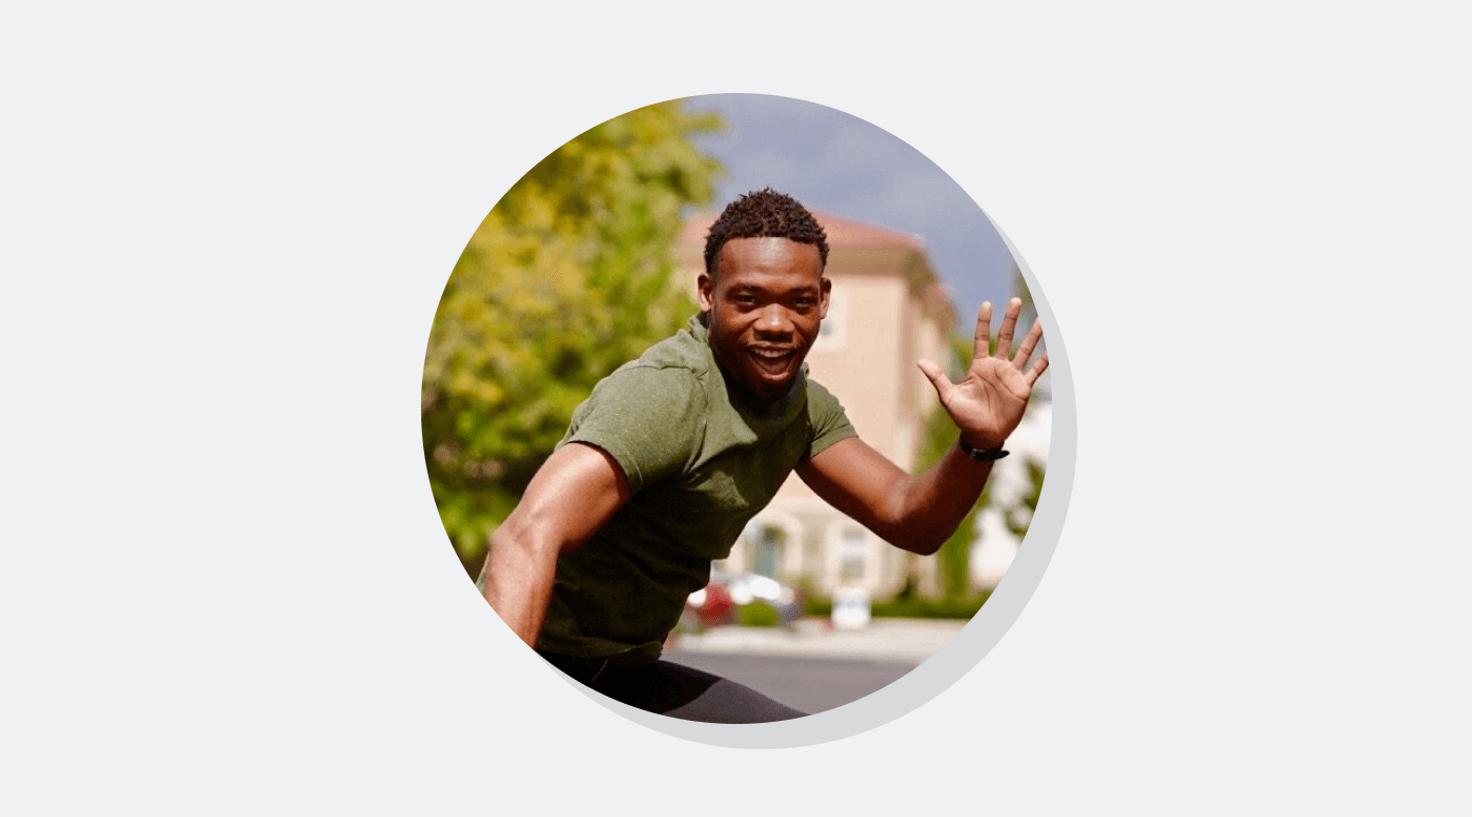 Image of Ronald Williams, Content Apprentice at CMX